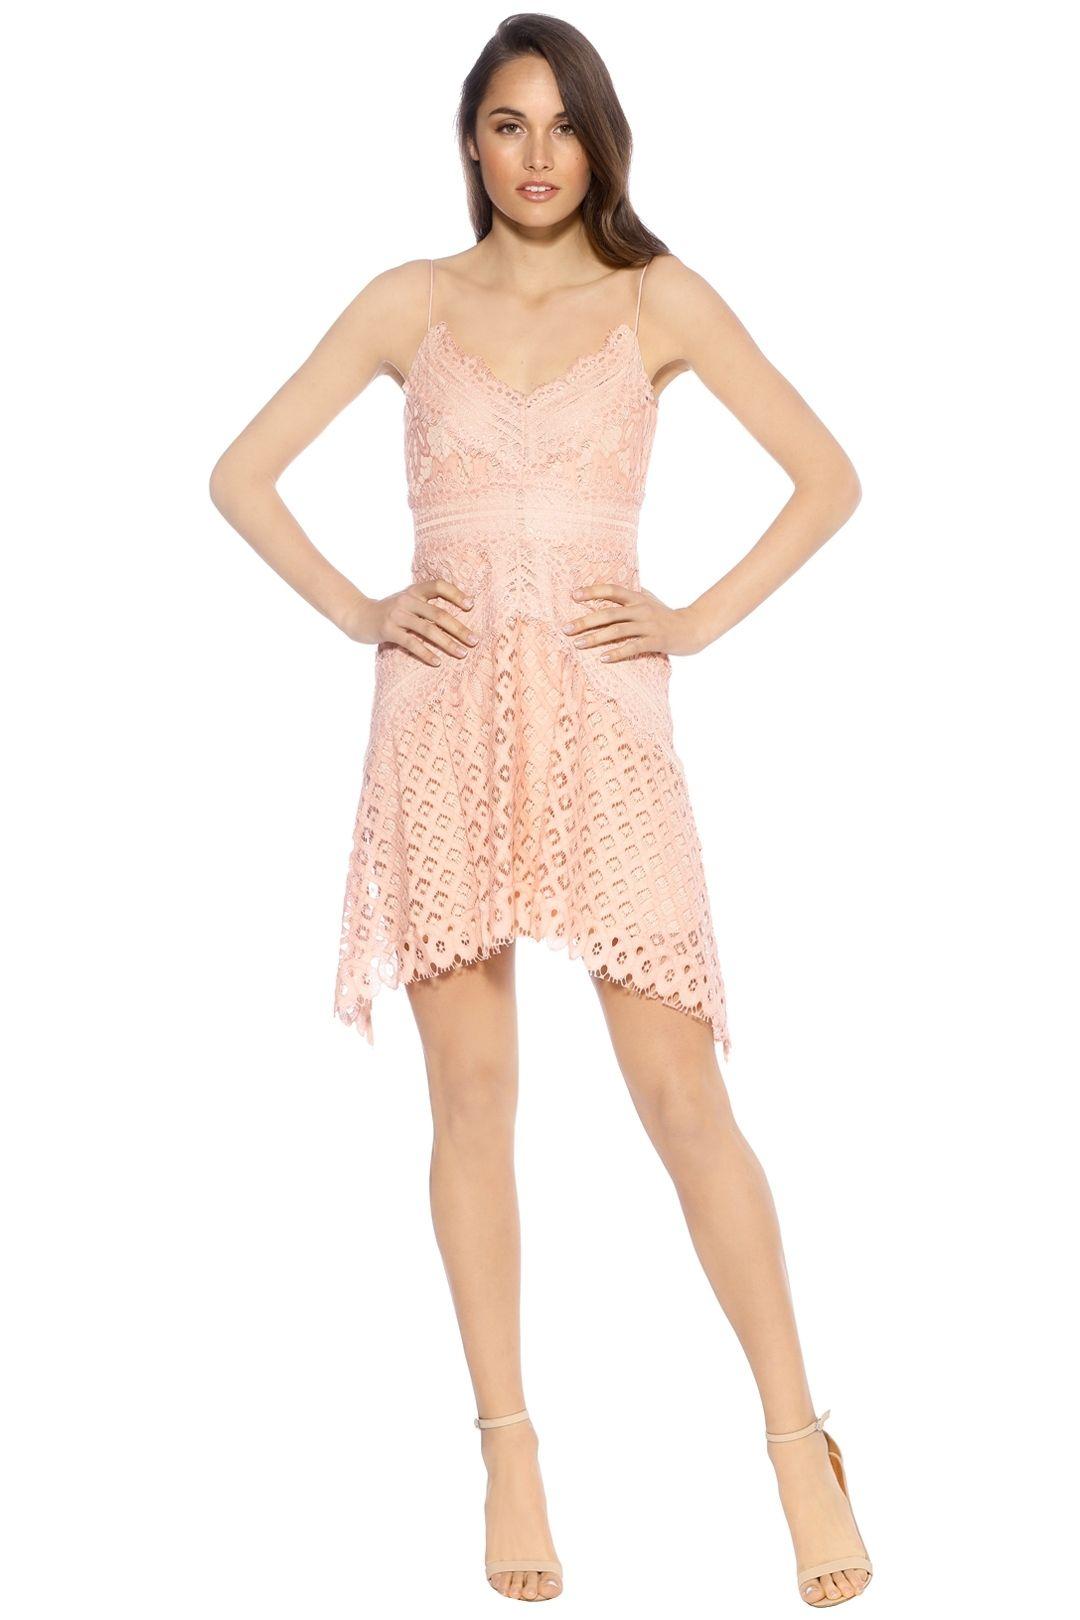 Keepsake The Label - Bridges Lace Mini Dress - Blush - Front